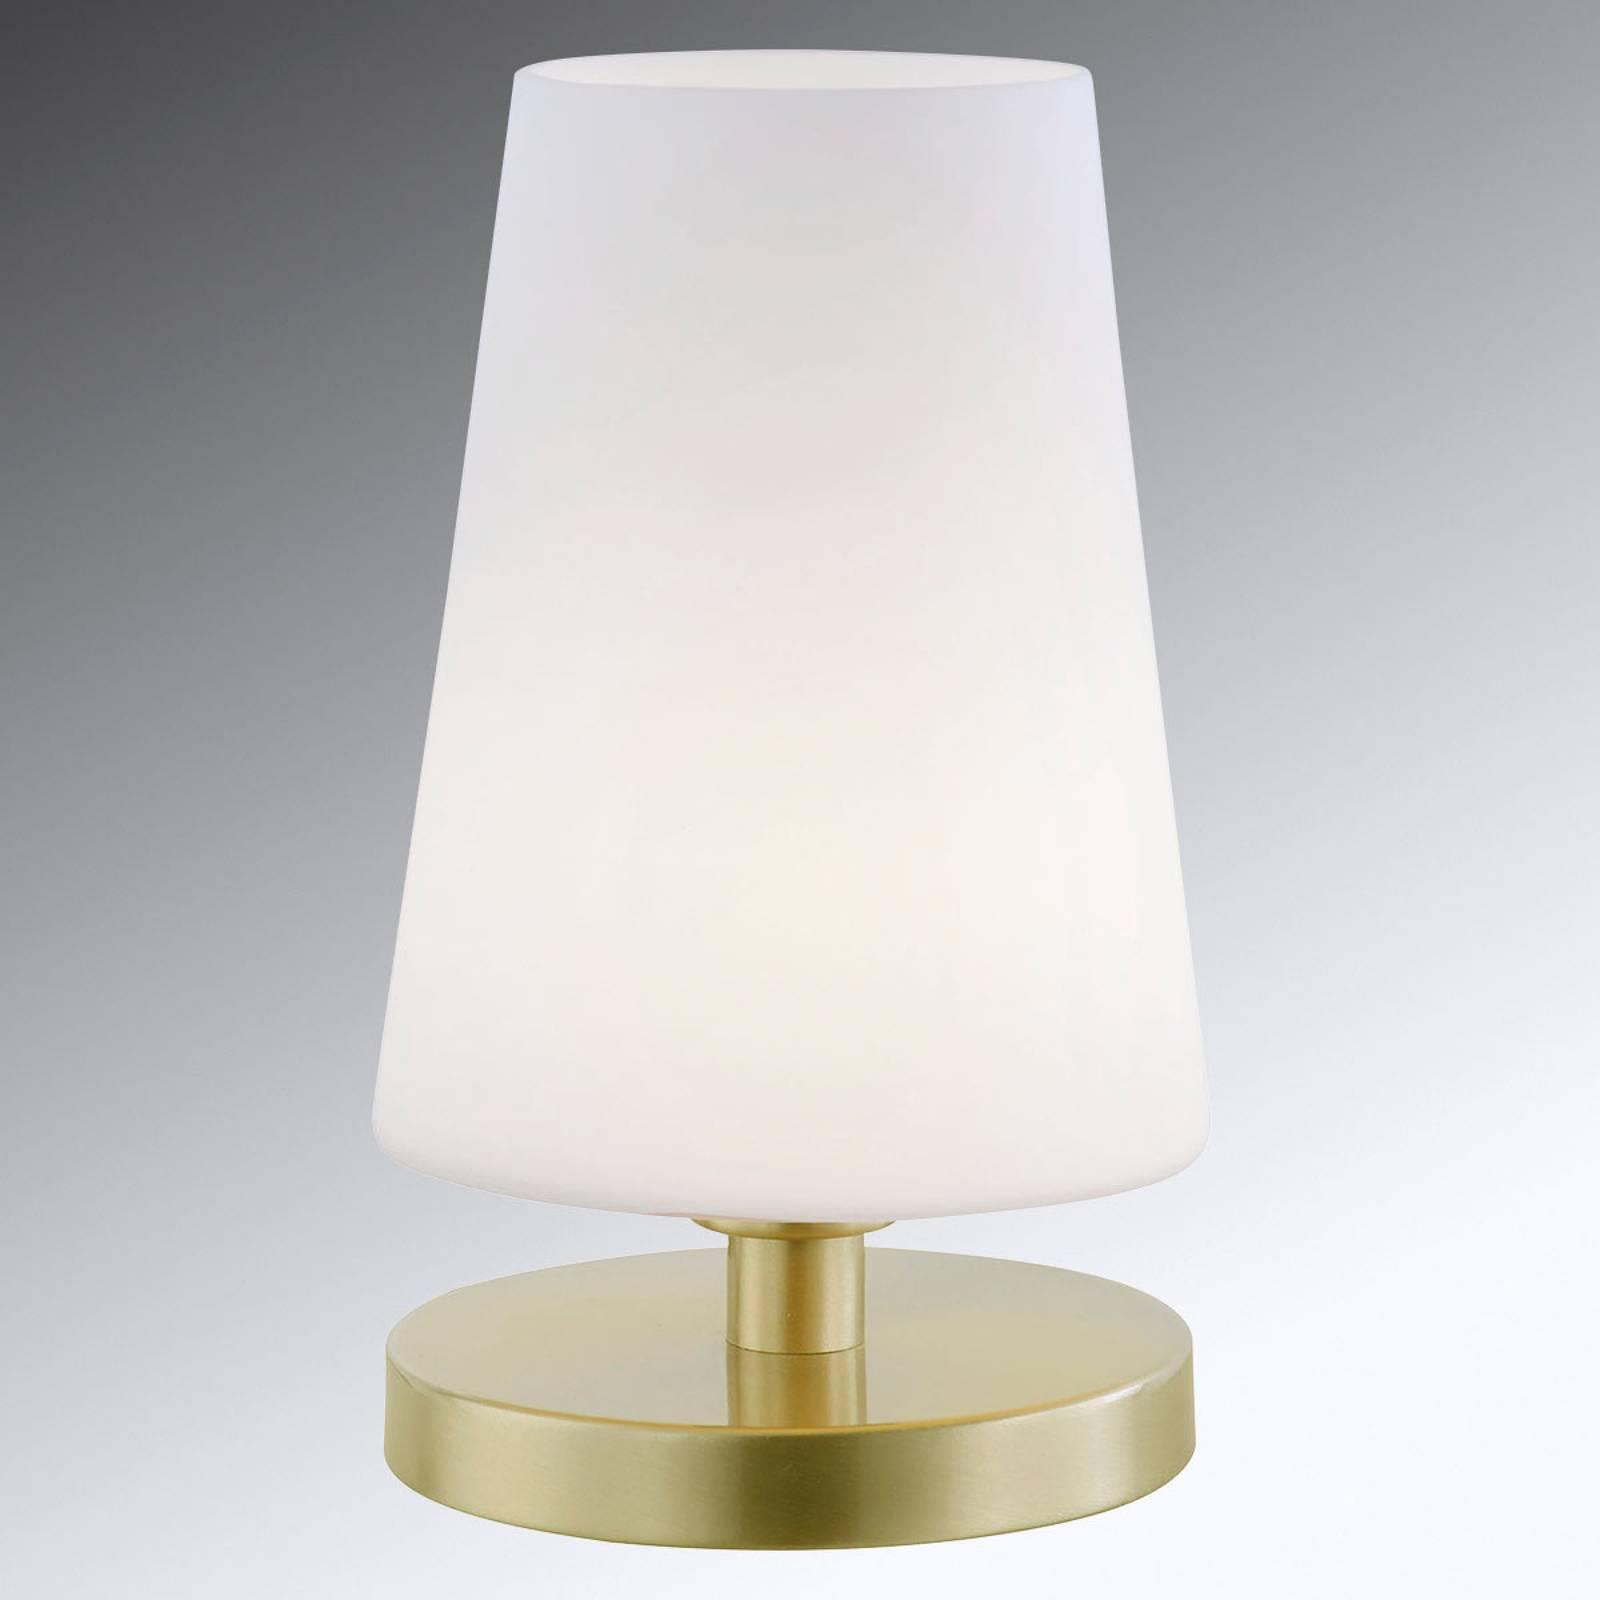 Dimbare LED tafellamp Sonja met glazen kap